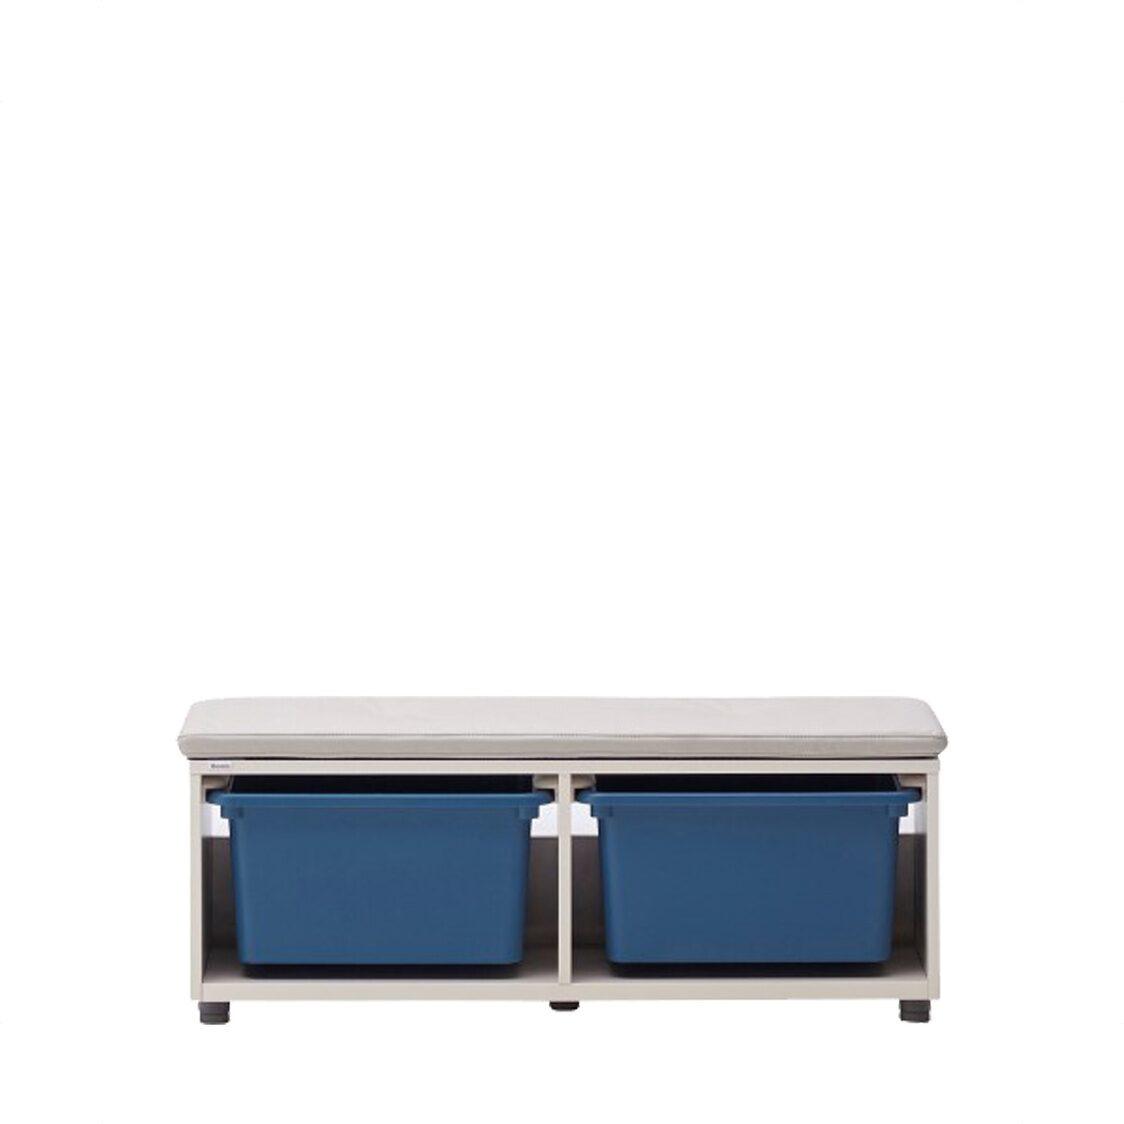 Iloom 950W Bench with storage HSFP191-IVKB